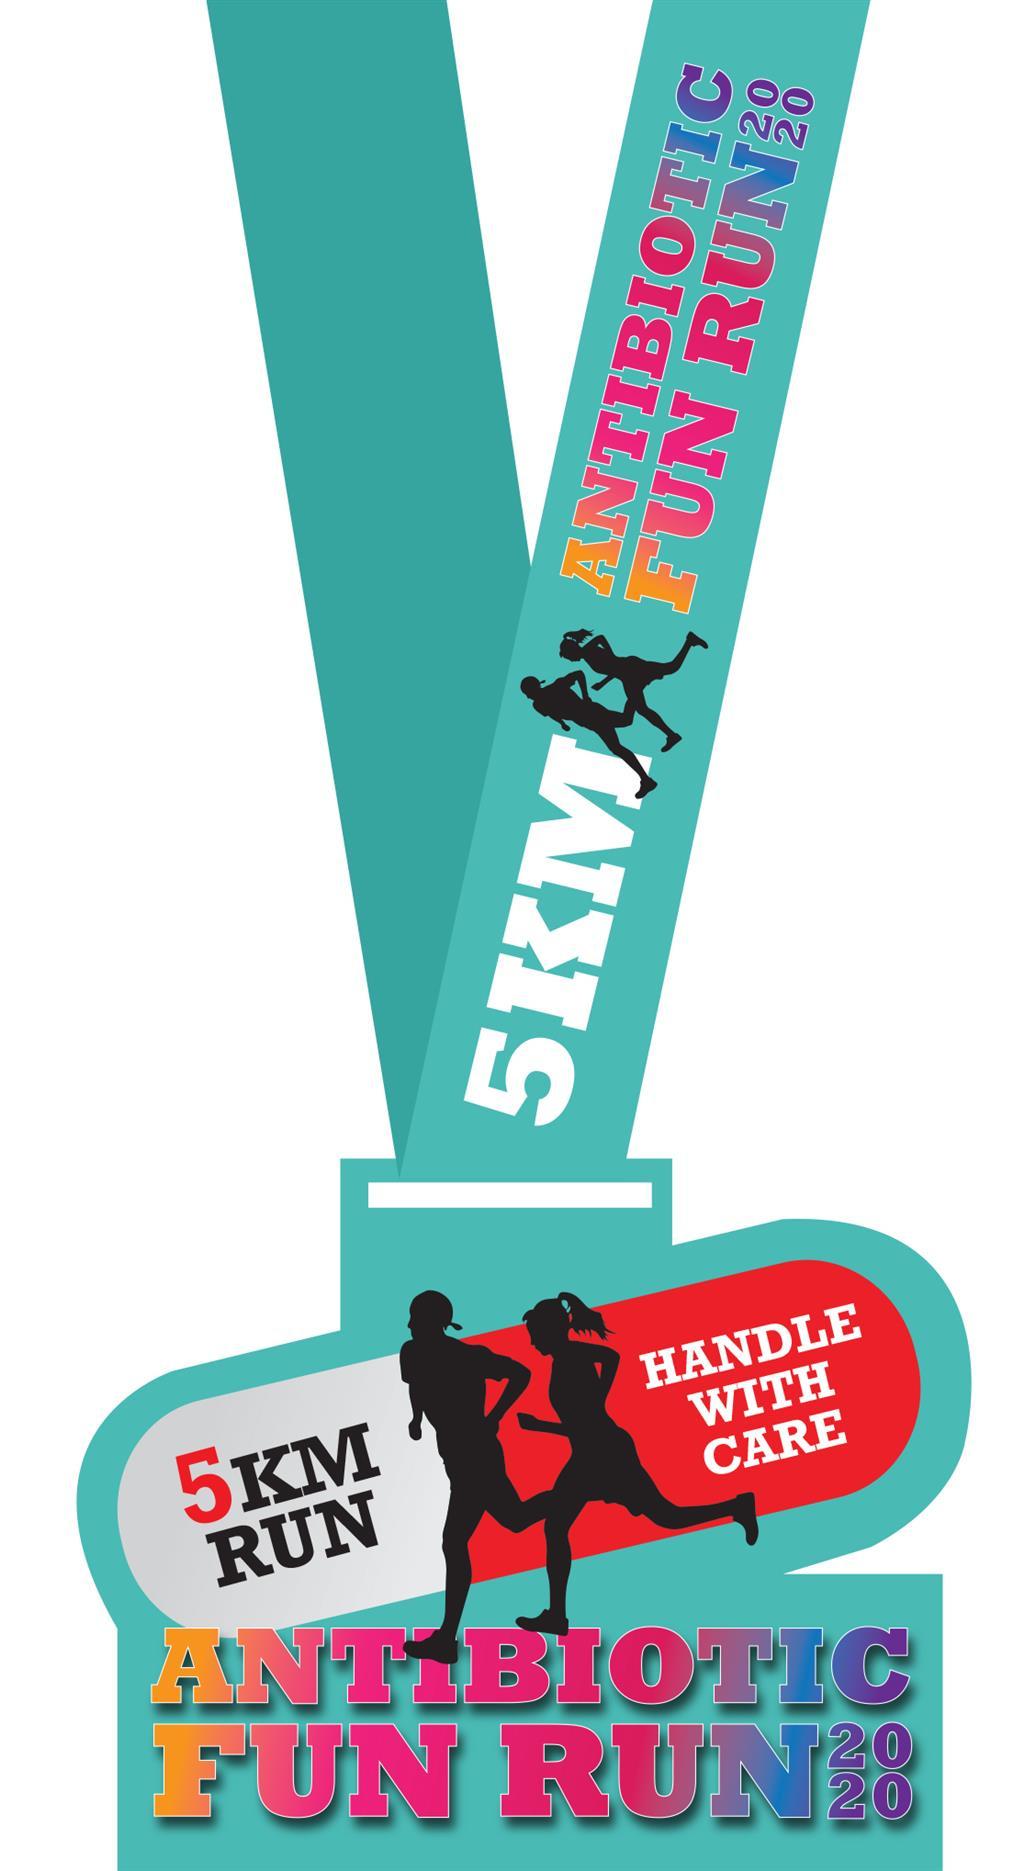 Antibiotic Fun Run 2020  Ticket2U with regard to Quality Marathon Certificate Template 7 Fun Run Designs